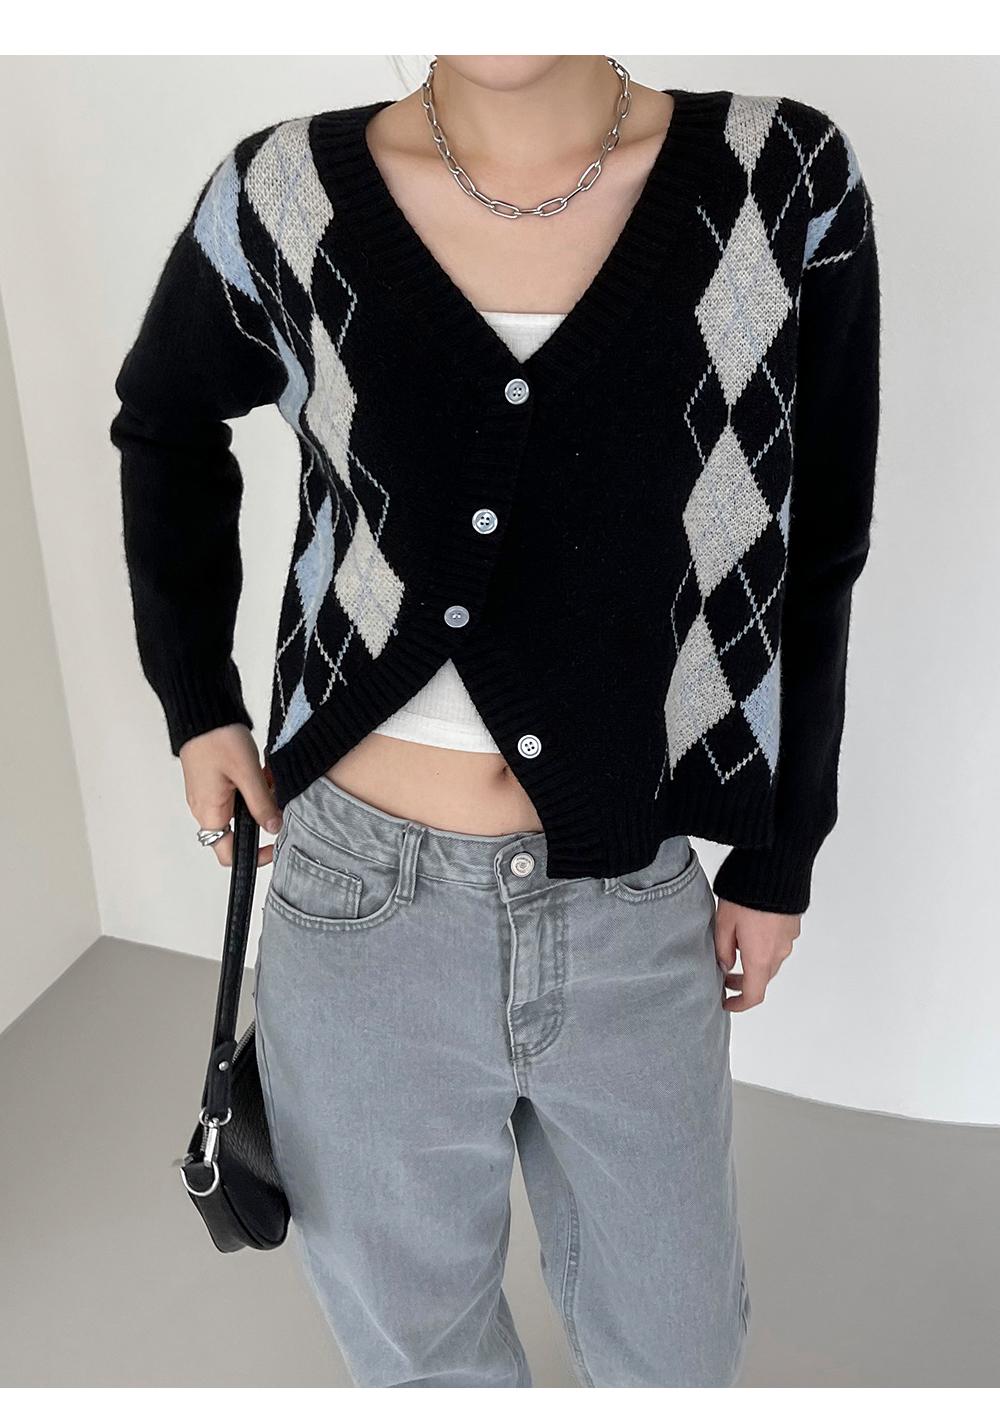 Clento V-Neck Argyle diagonal cardigan